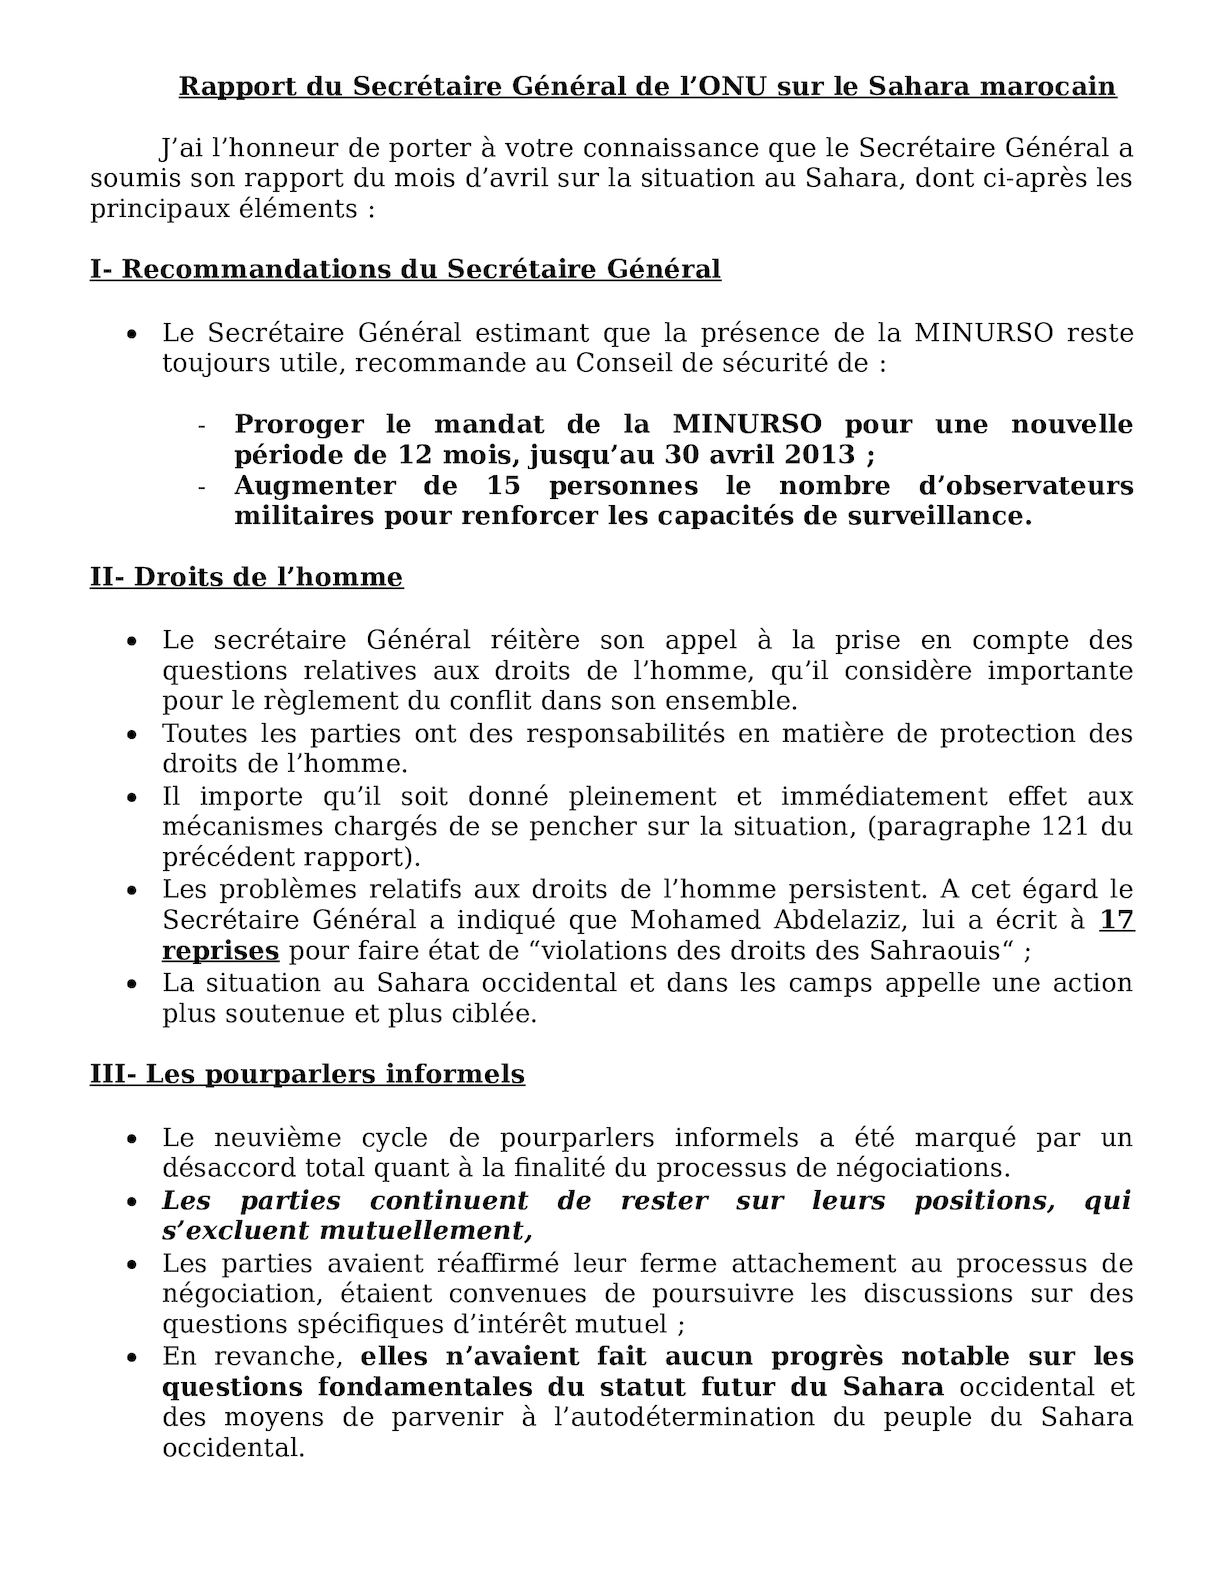 Sahara Rapport Sg 2012